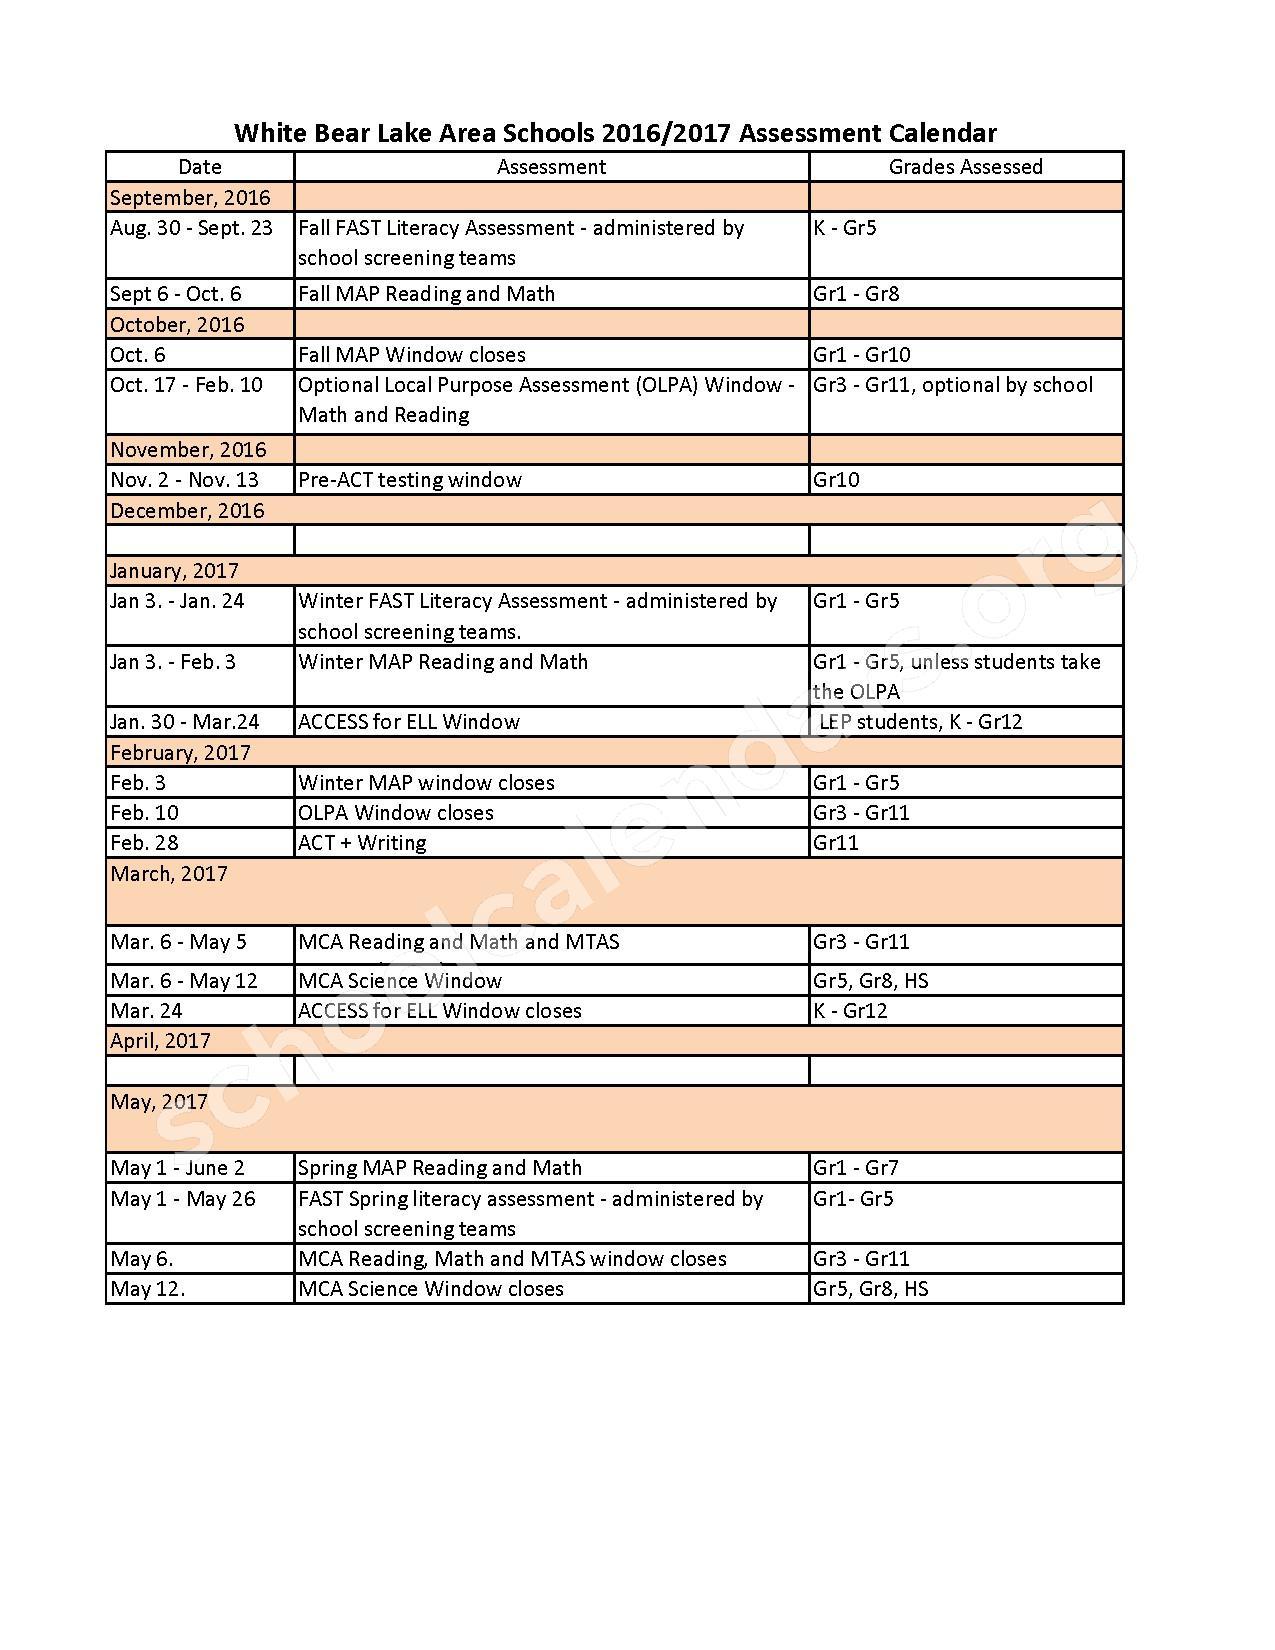 2016 - 2017 District Assessment Calendar – White Bear Lake School District – page 1